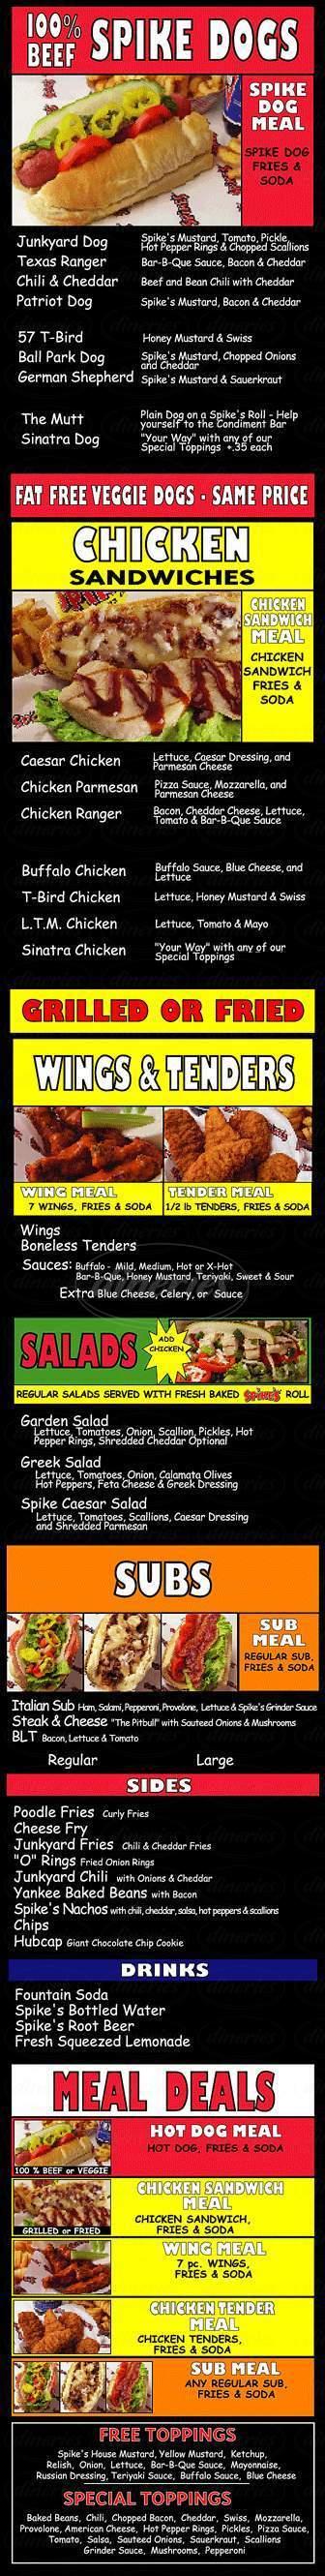 menu for Spike's Junkyard Dogs